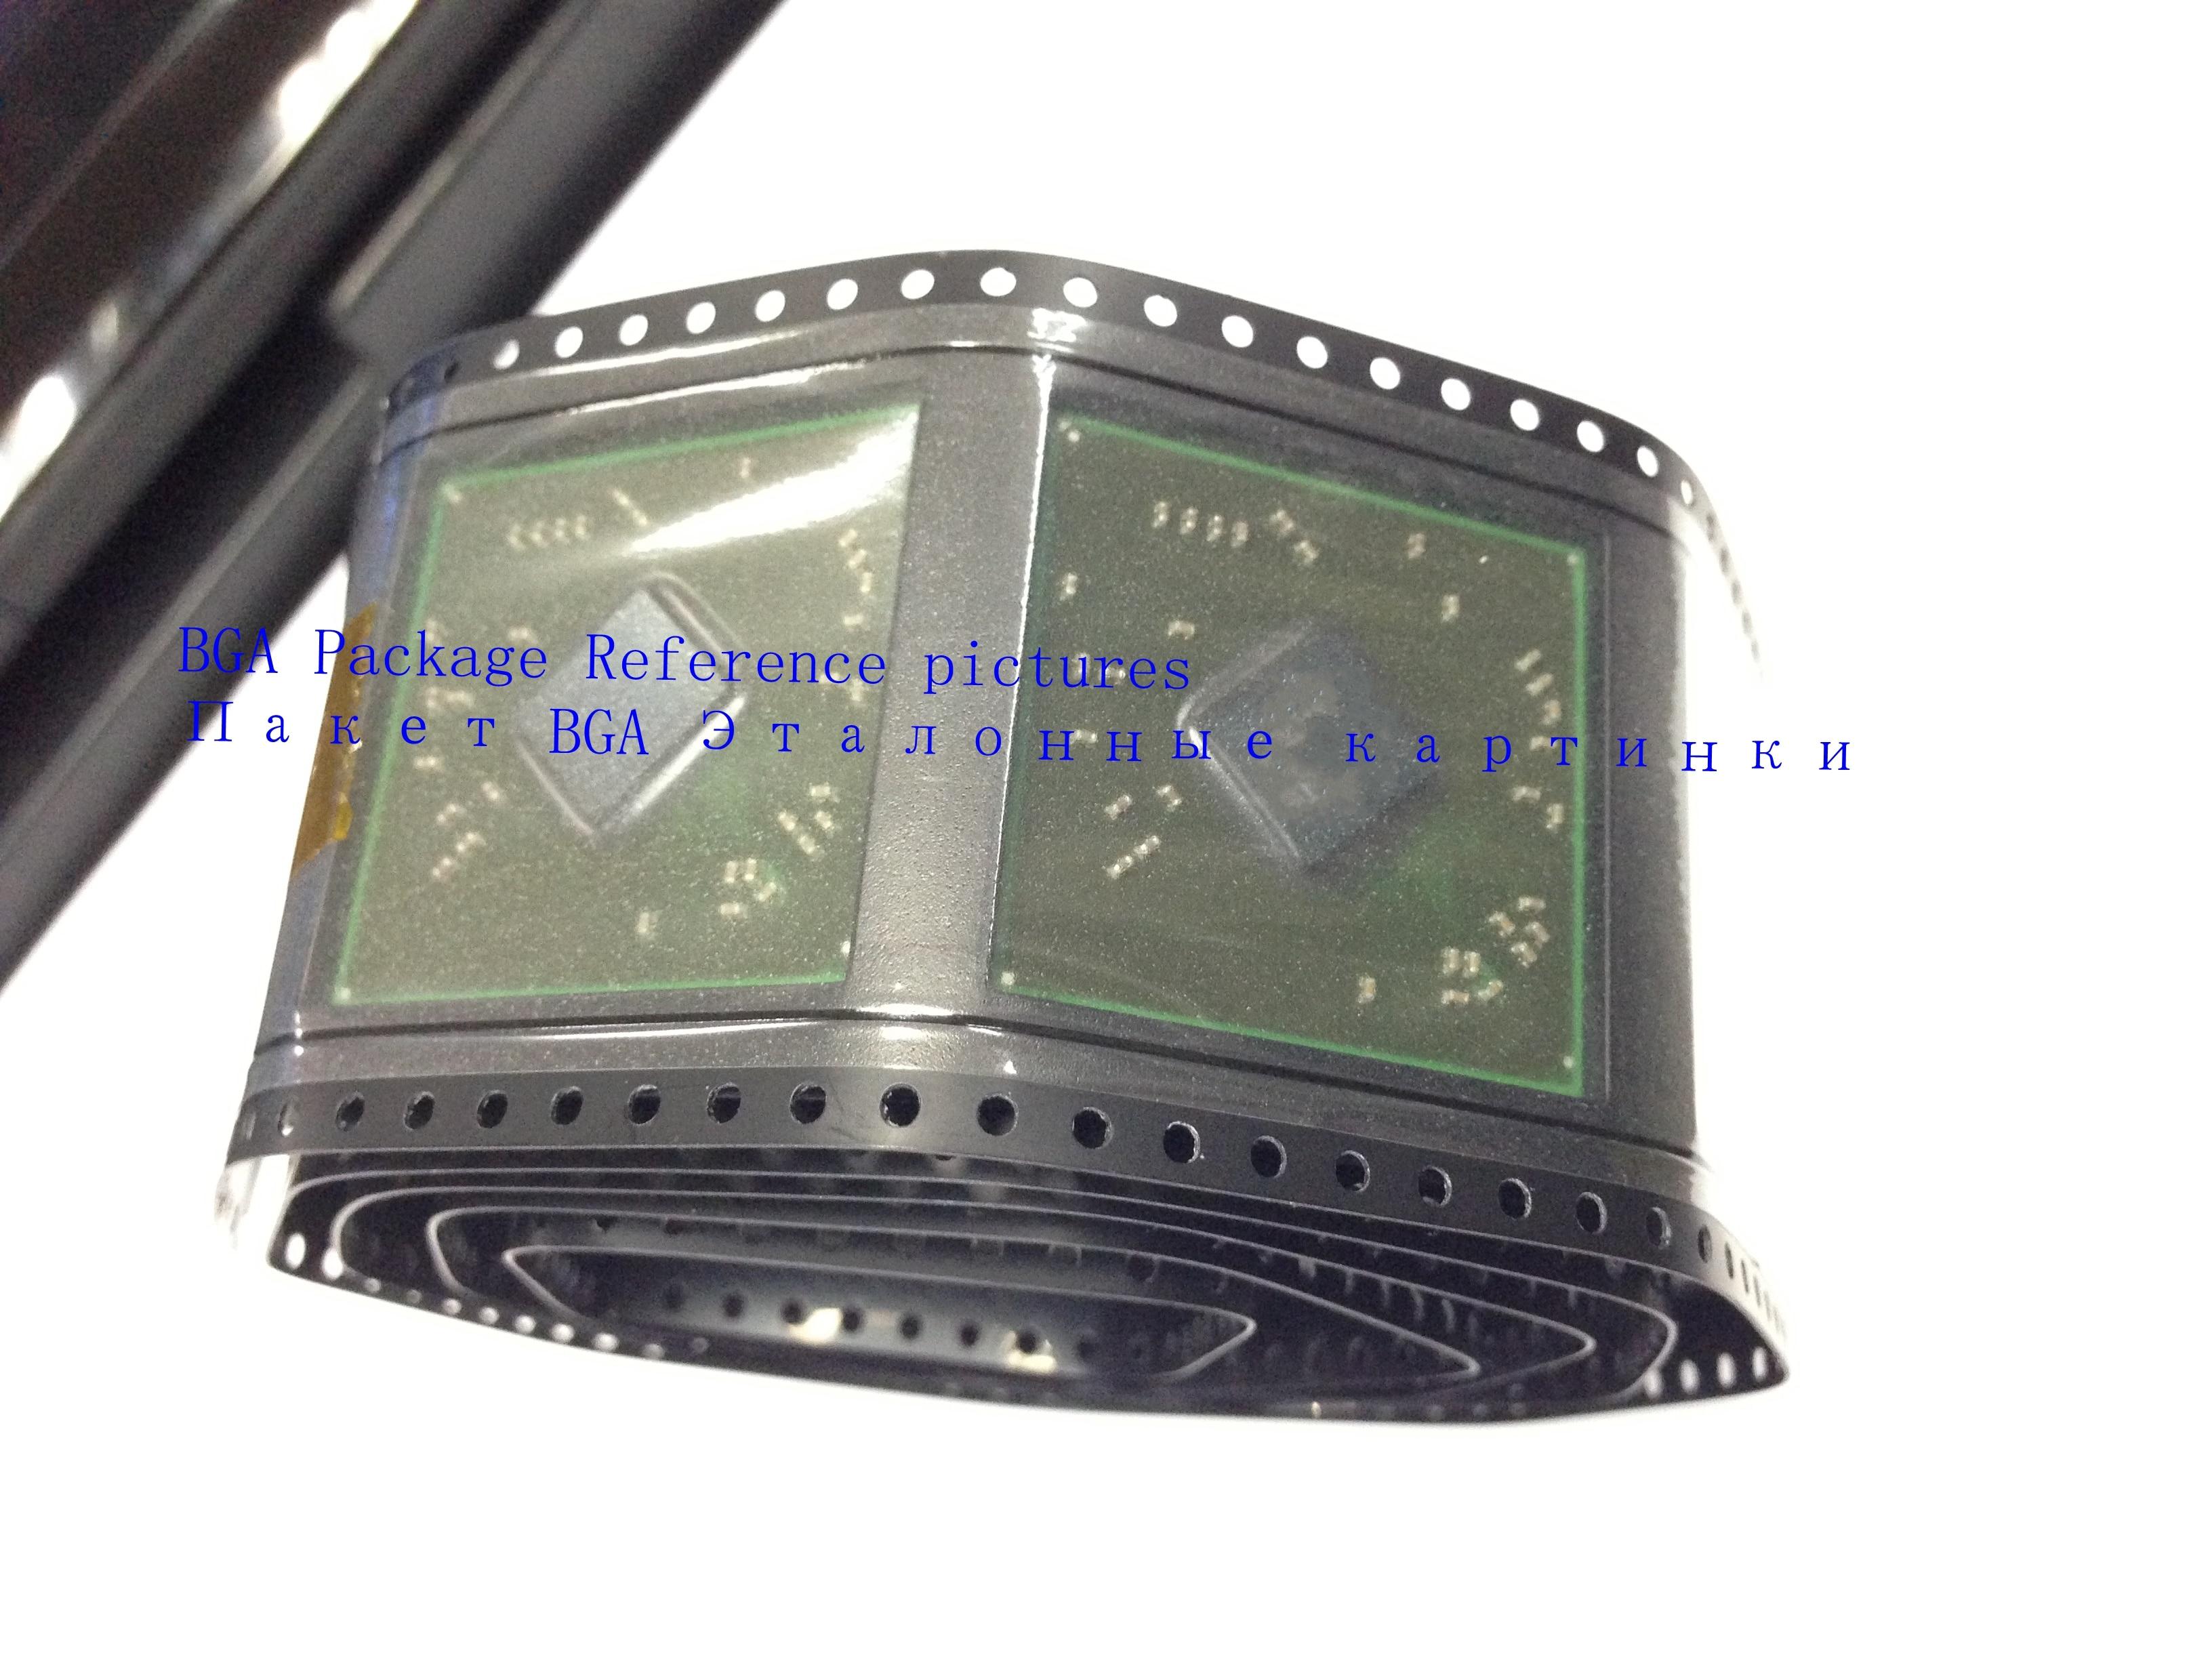 1pcs/lot 100% New MCP7A-LP-B3 MCP7A LP B3 BGA Chipset1pcs/lot 100% New MCP7A-LP-B3 MCP7A LP B3 BGA Chipset